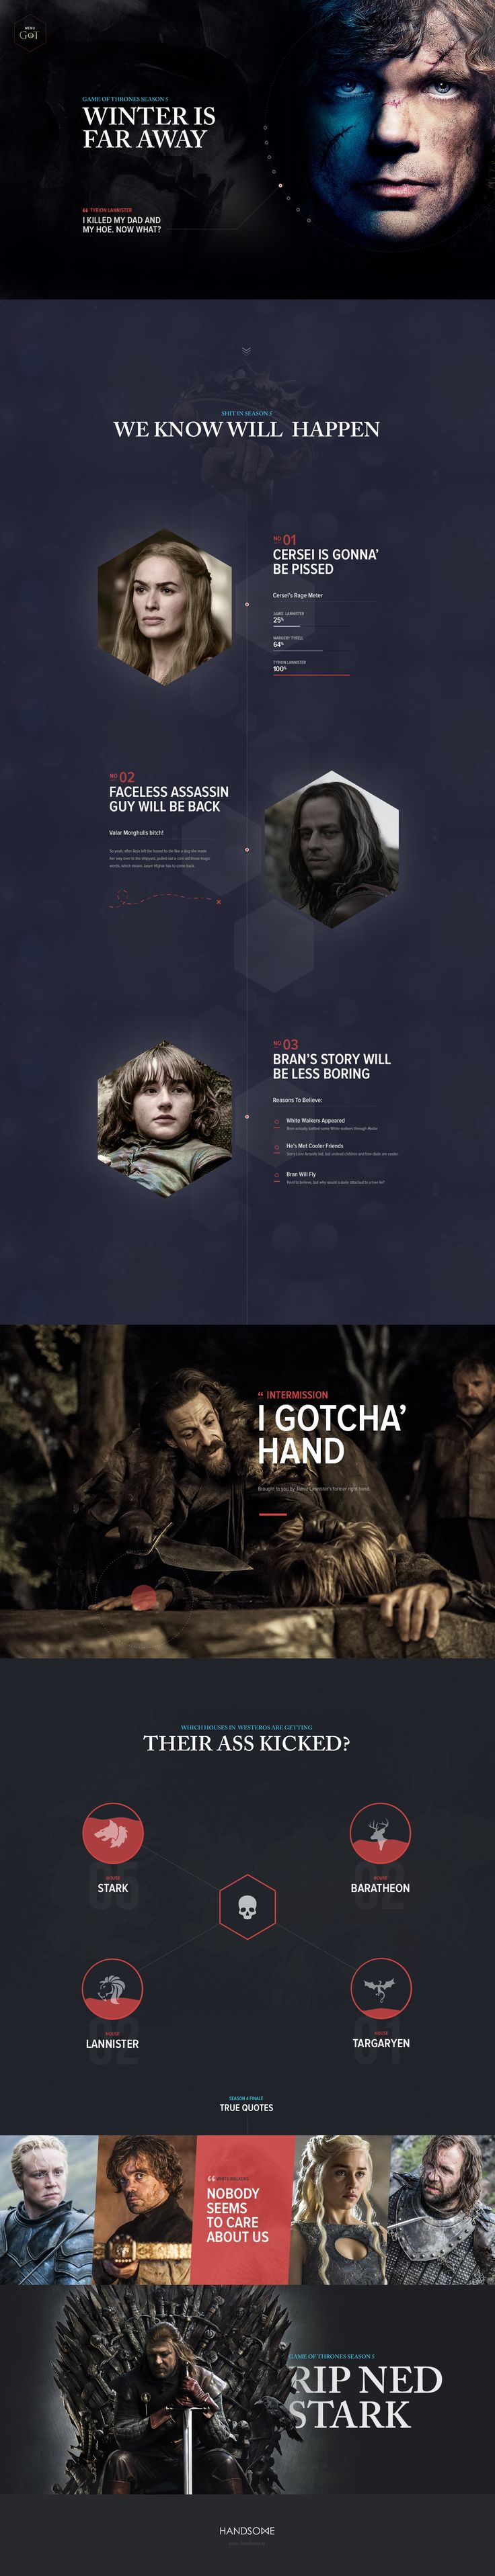 Game of Thrones Season 5 plots via @handsome.is